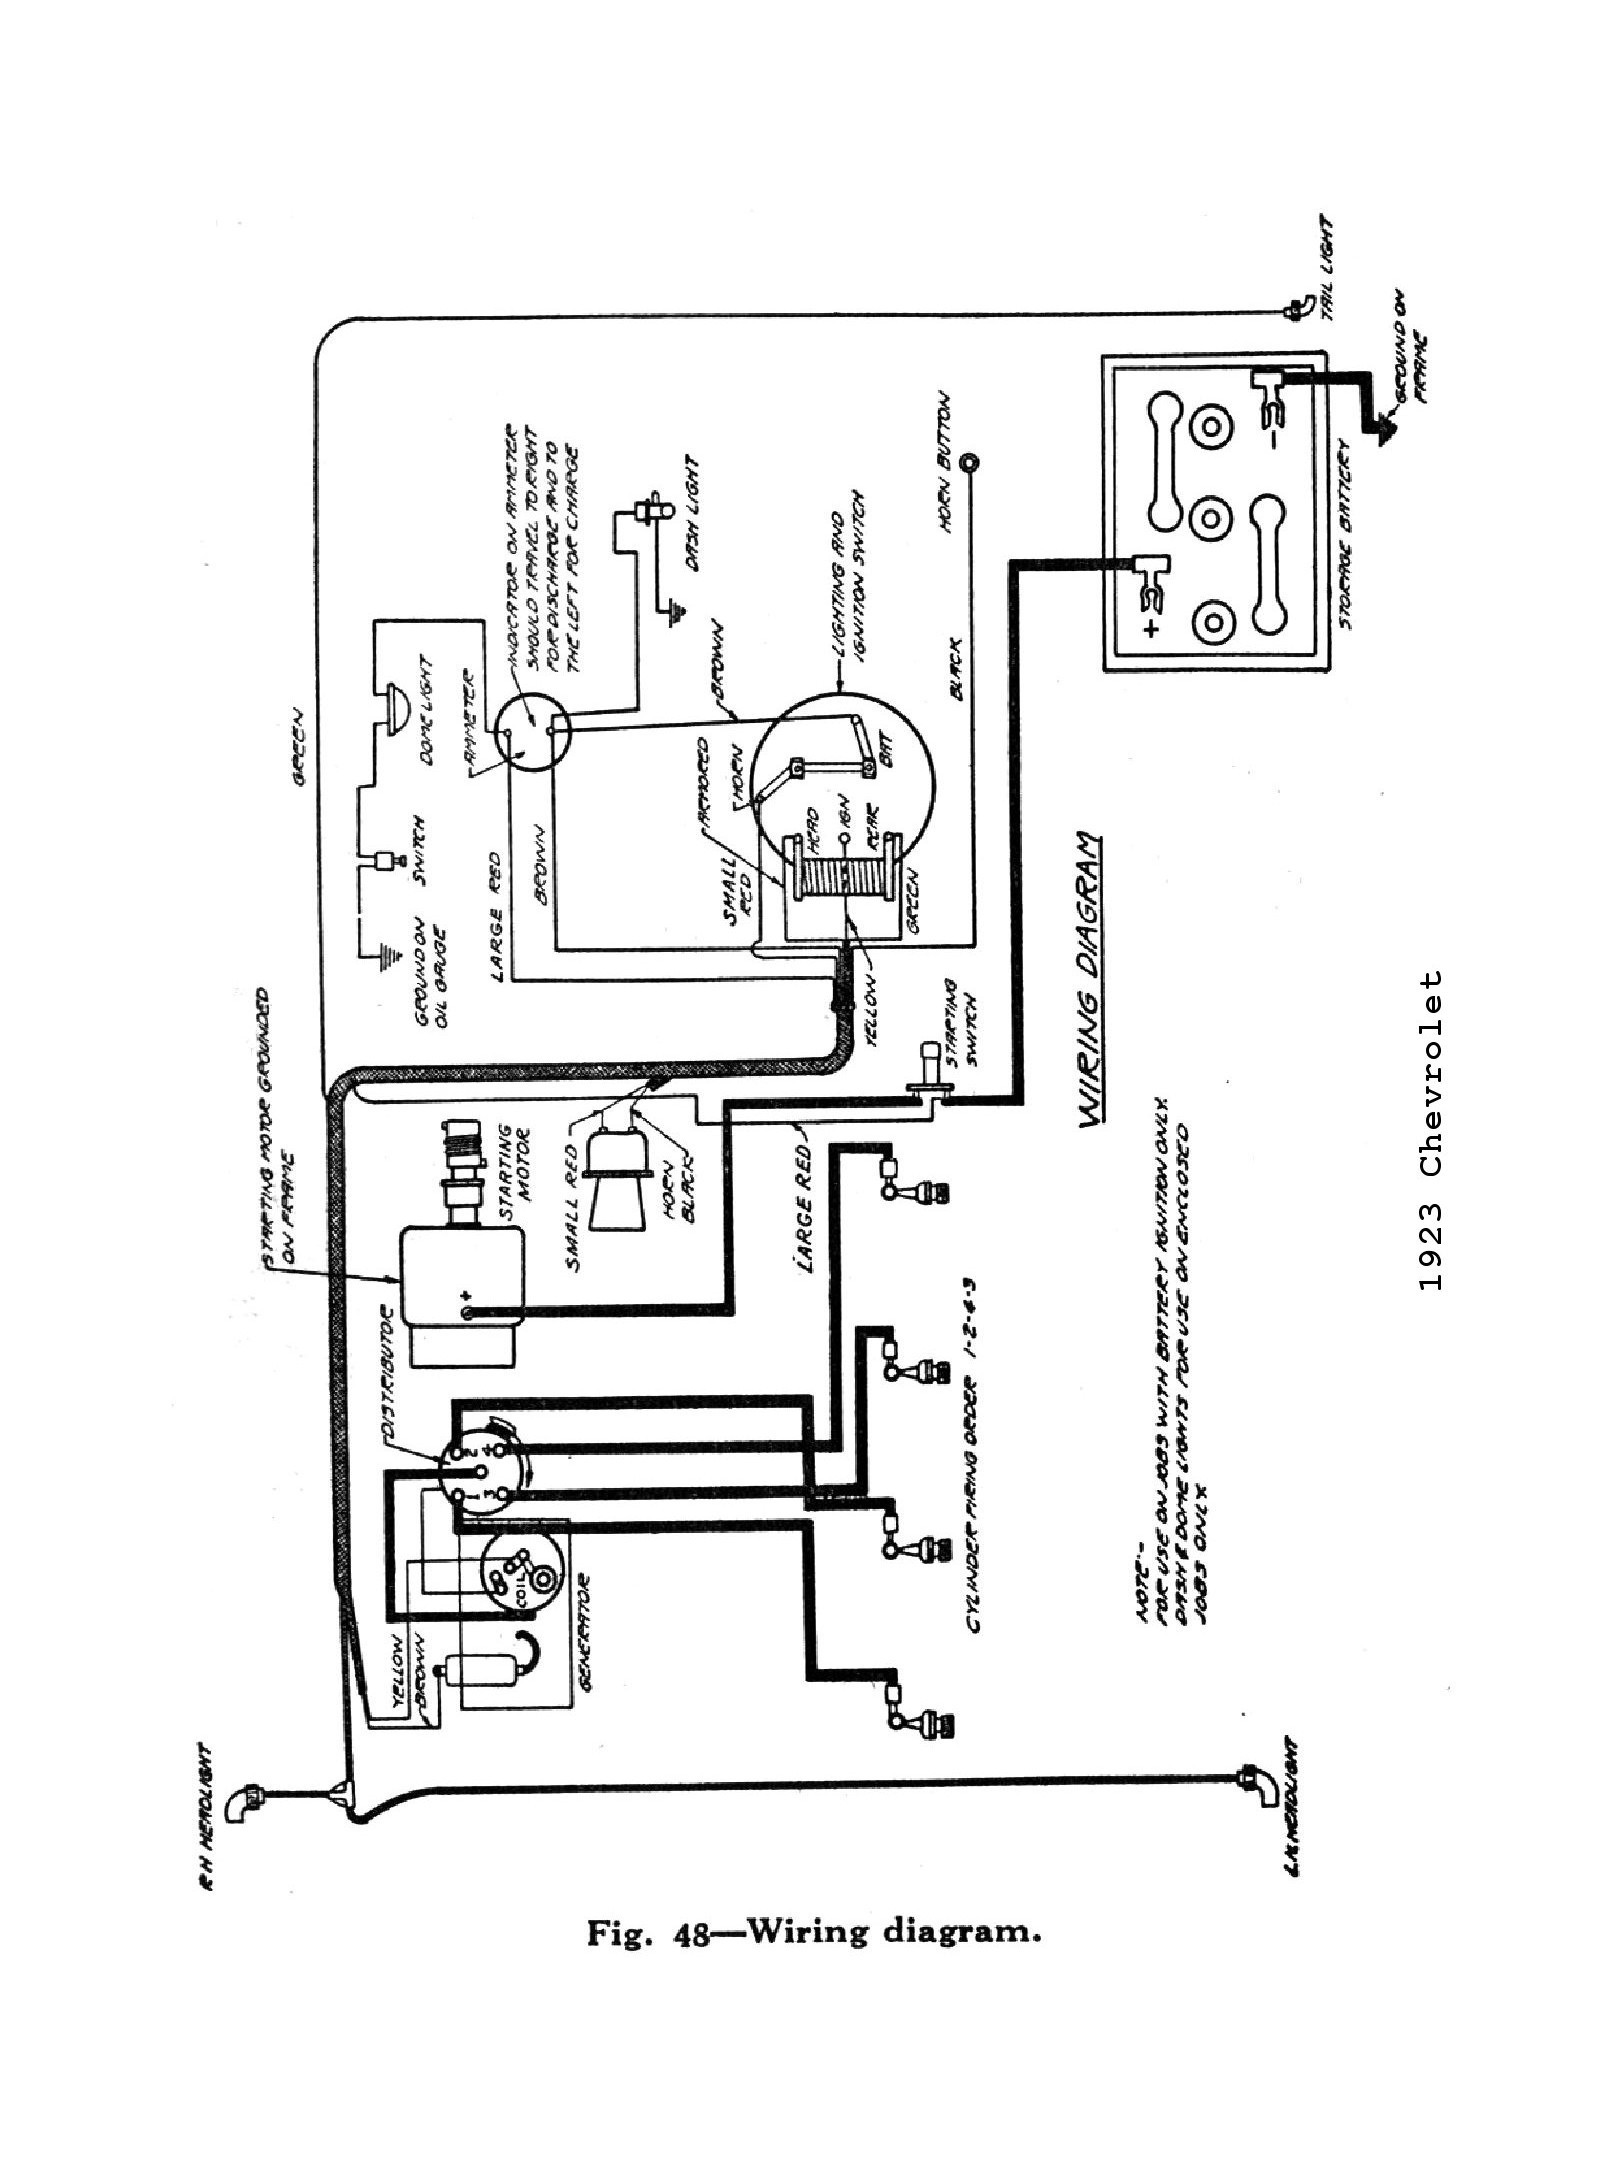 2000 Chevy Impala 3 4 Engine Diagram Wiring Diagrams Of 2000 Chevy Impala 3 4 Engine Diagram